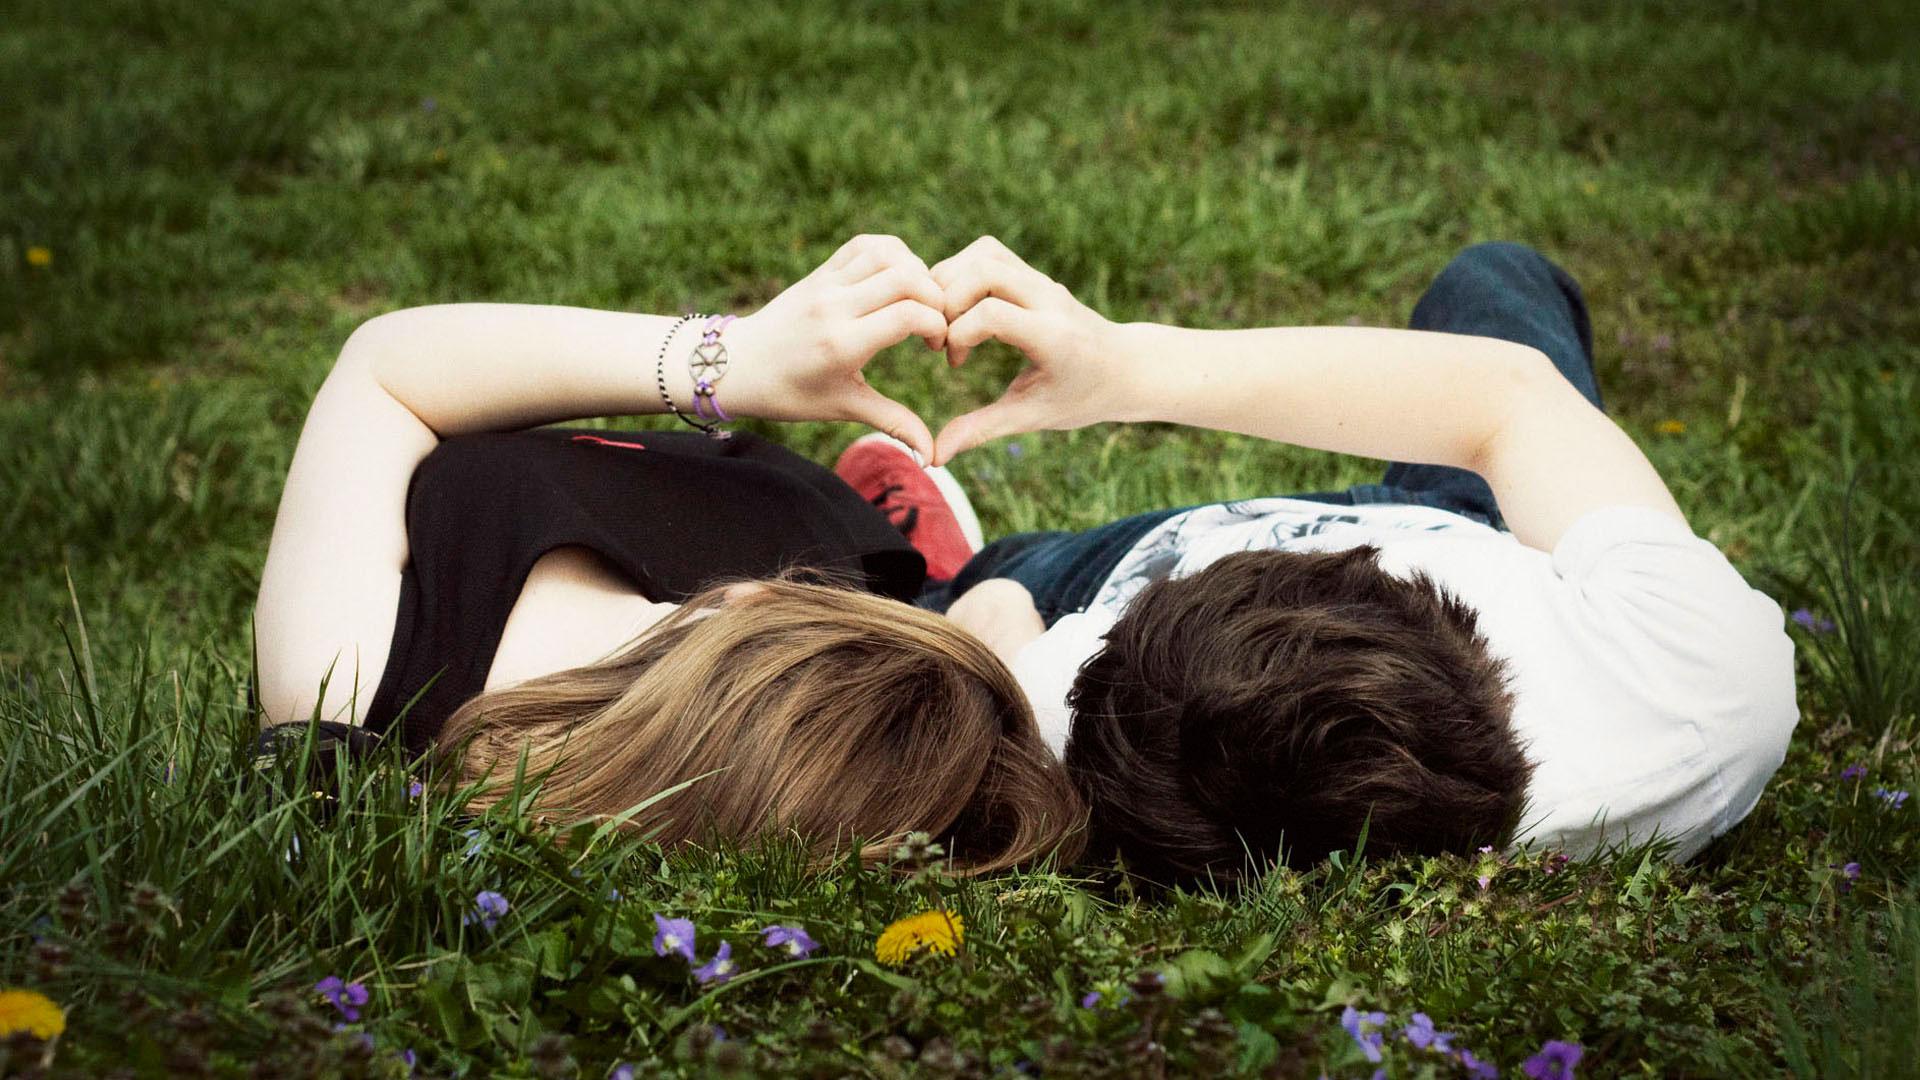 Романтические картинки для девушки на аву